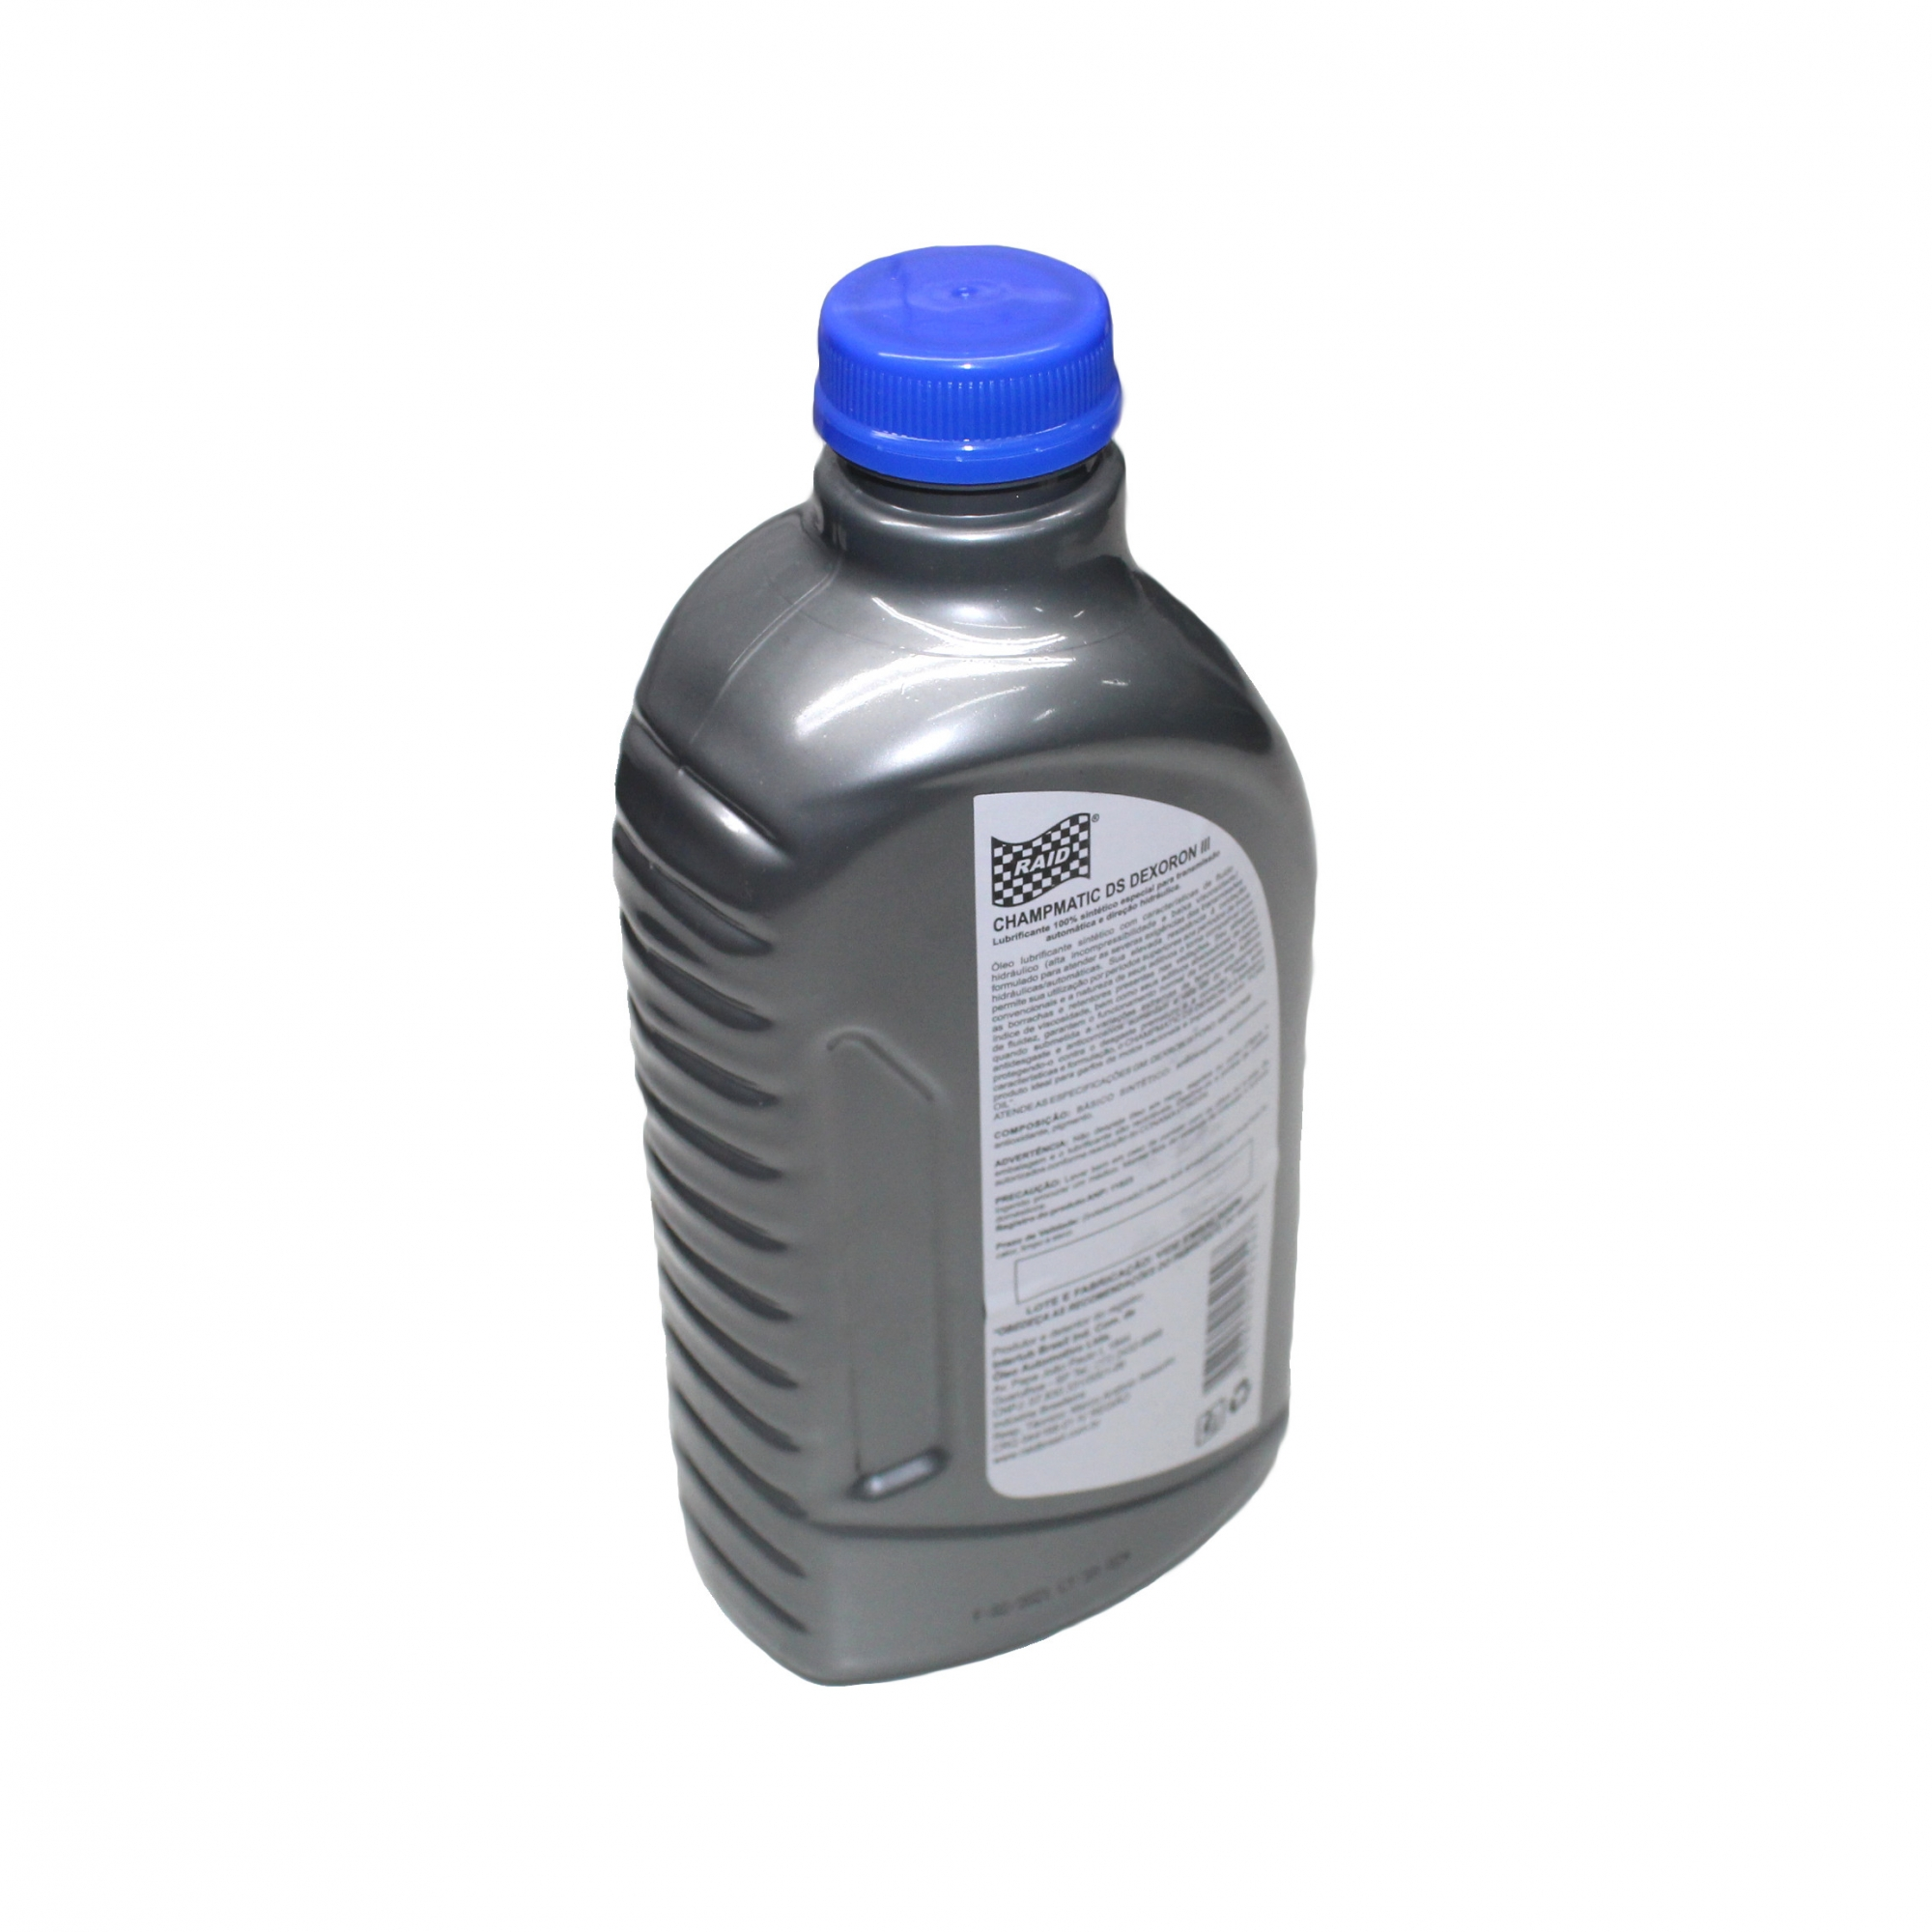 Óleo Fluido Direção Hidráulica Champmatic Dexron 3 - Sintetico